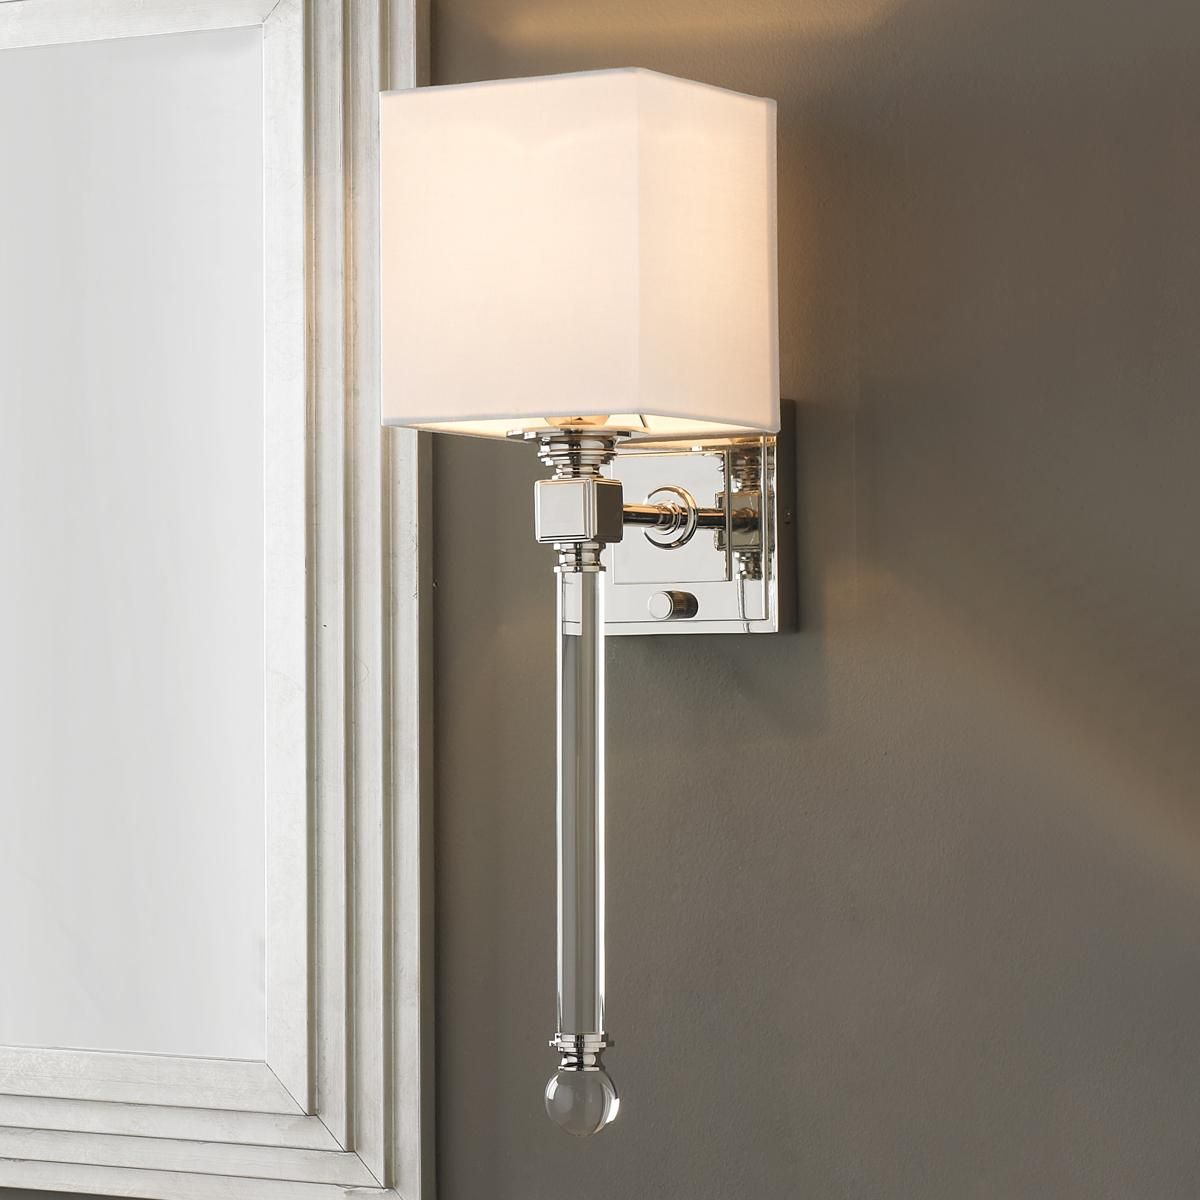 Candle Wall Sconces Bathroom Chrome Wall Sconces Bathroom